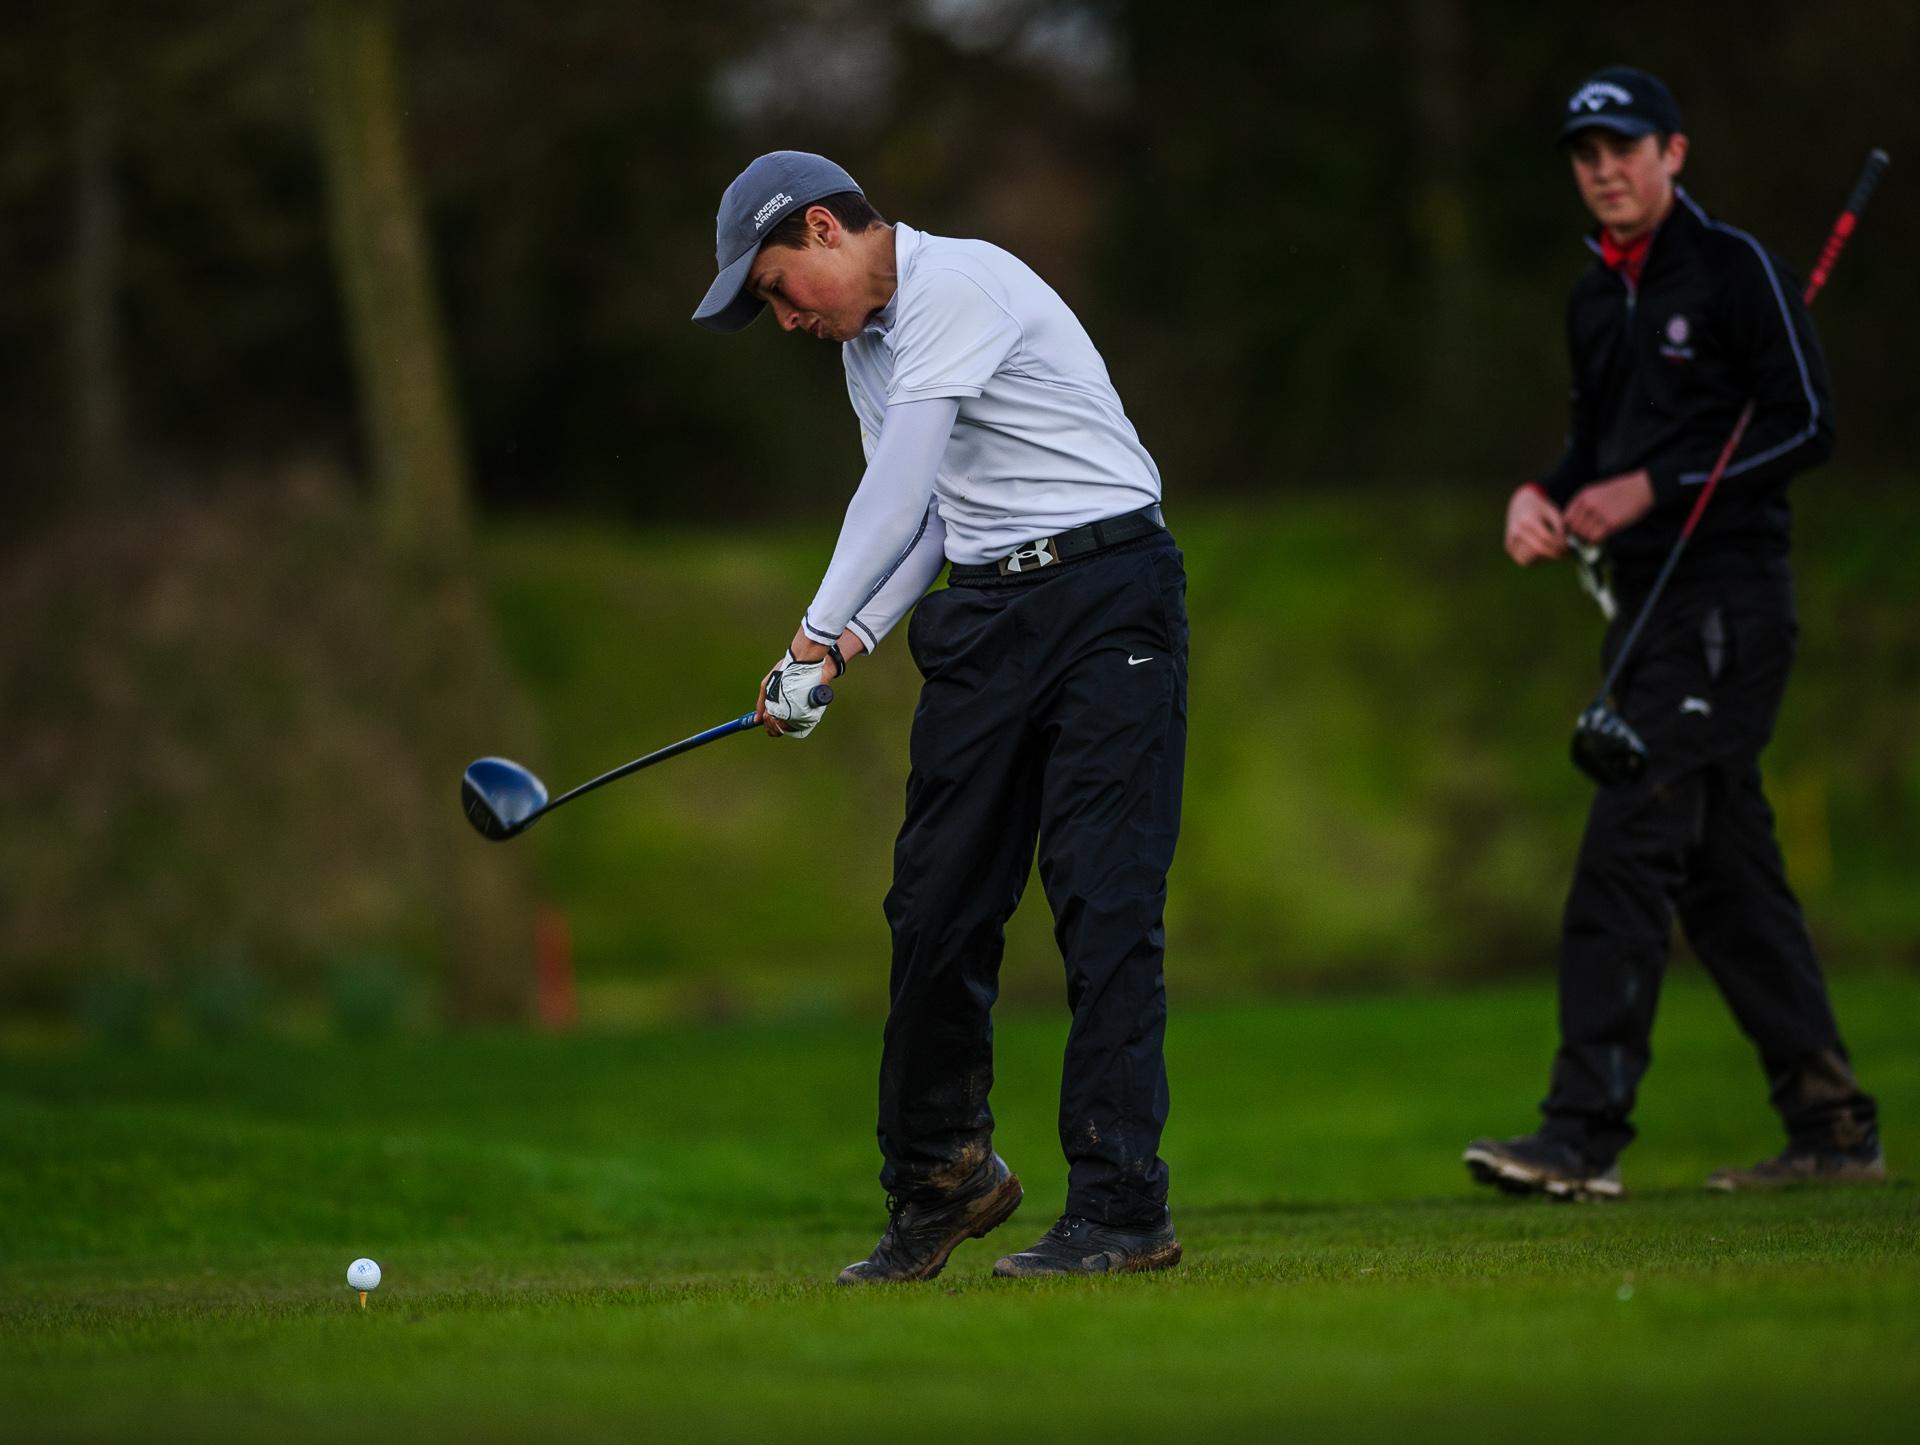 Kevindiss.com golf course photography Hawkstone Park golf course-1123.jpg